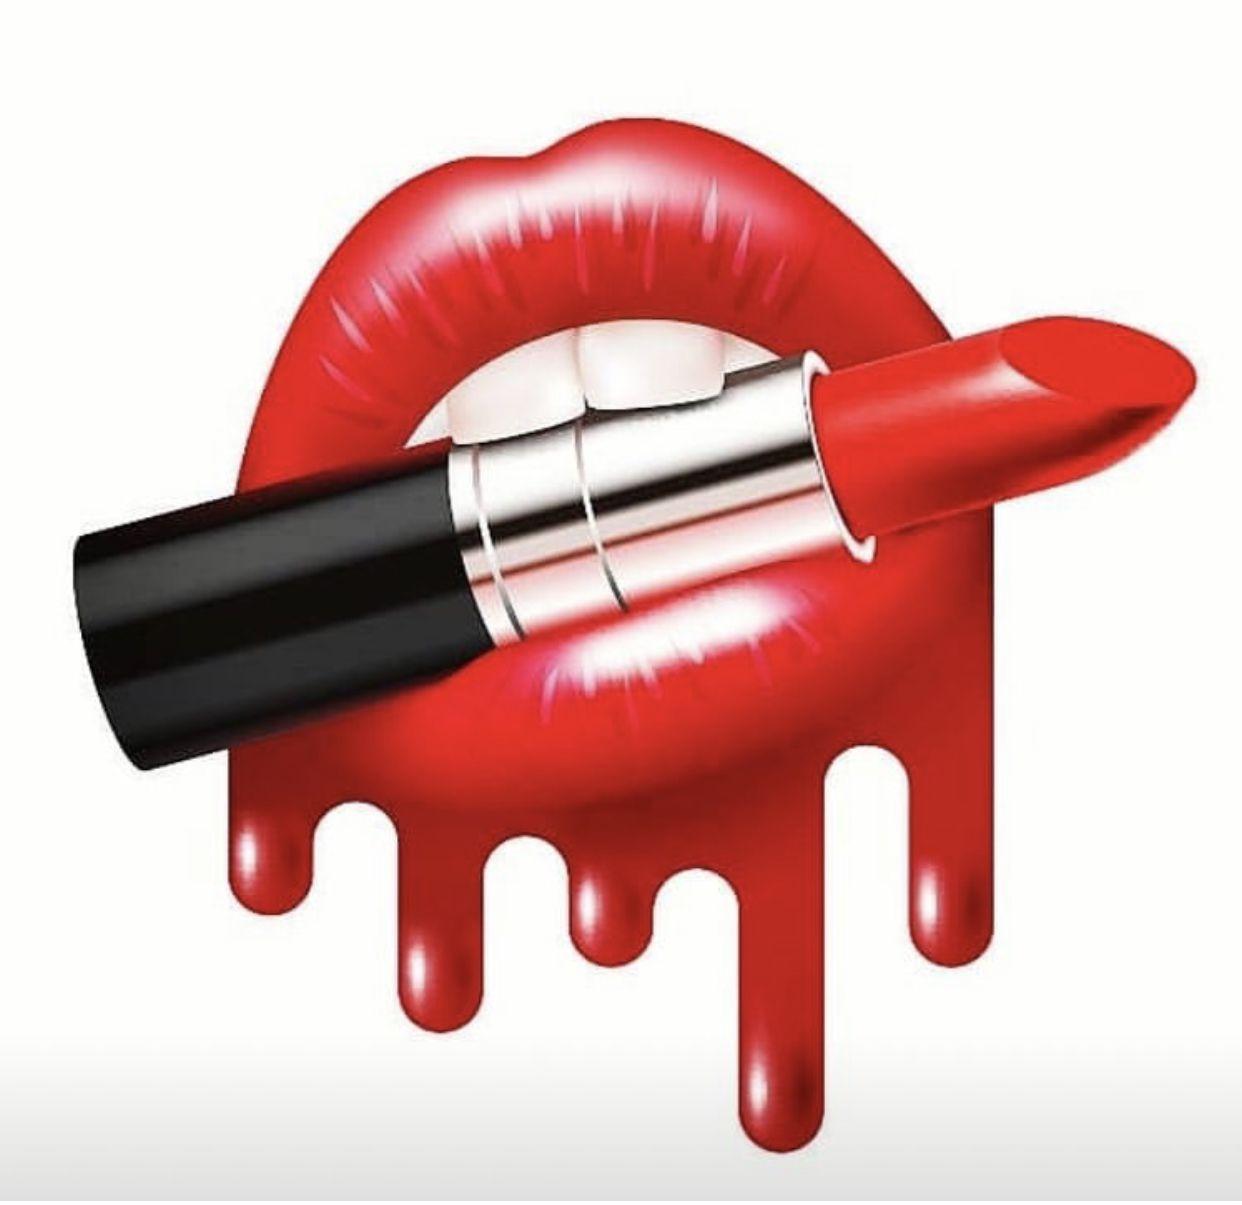 Pin By Lais On Art Photos Makeup Illustration Pop Art Lips Makeup Artist Logo